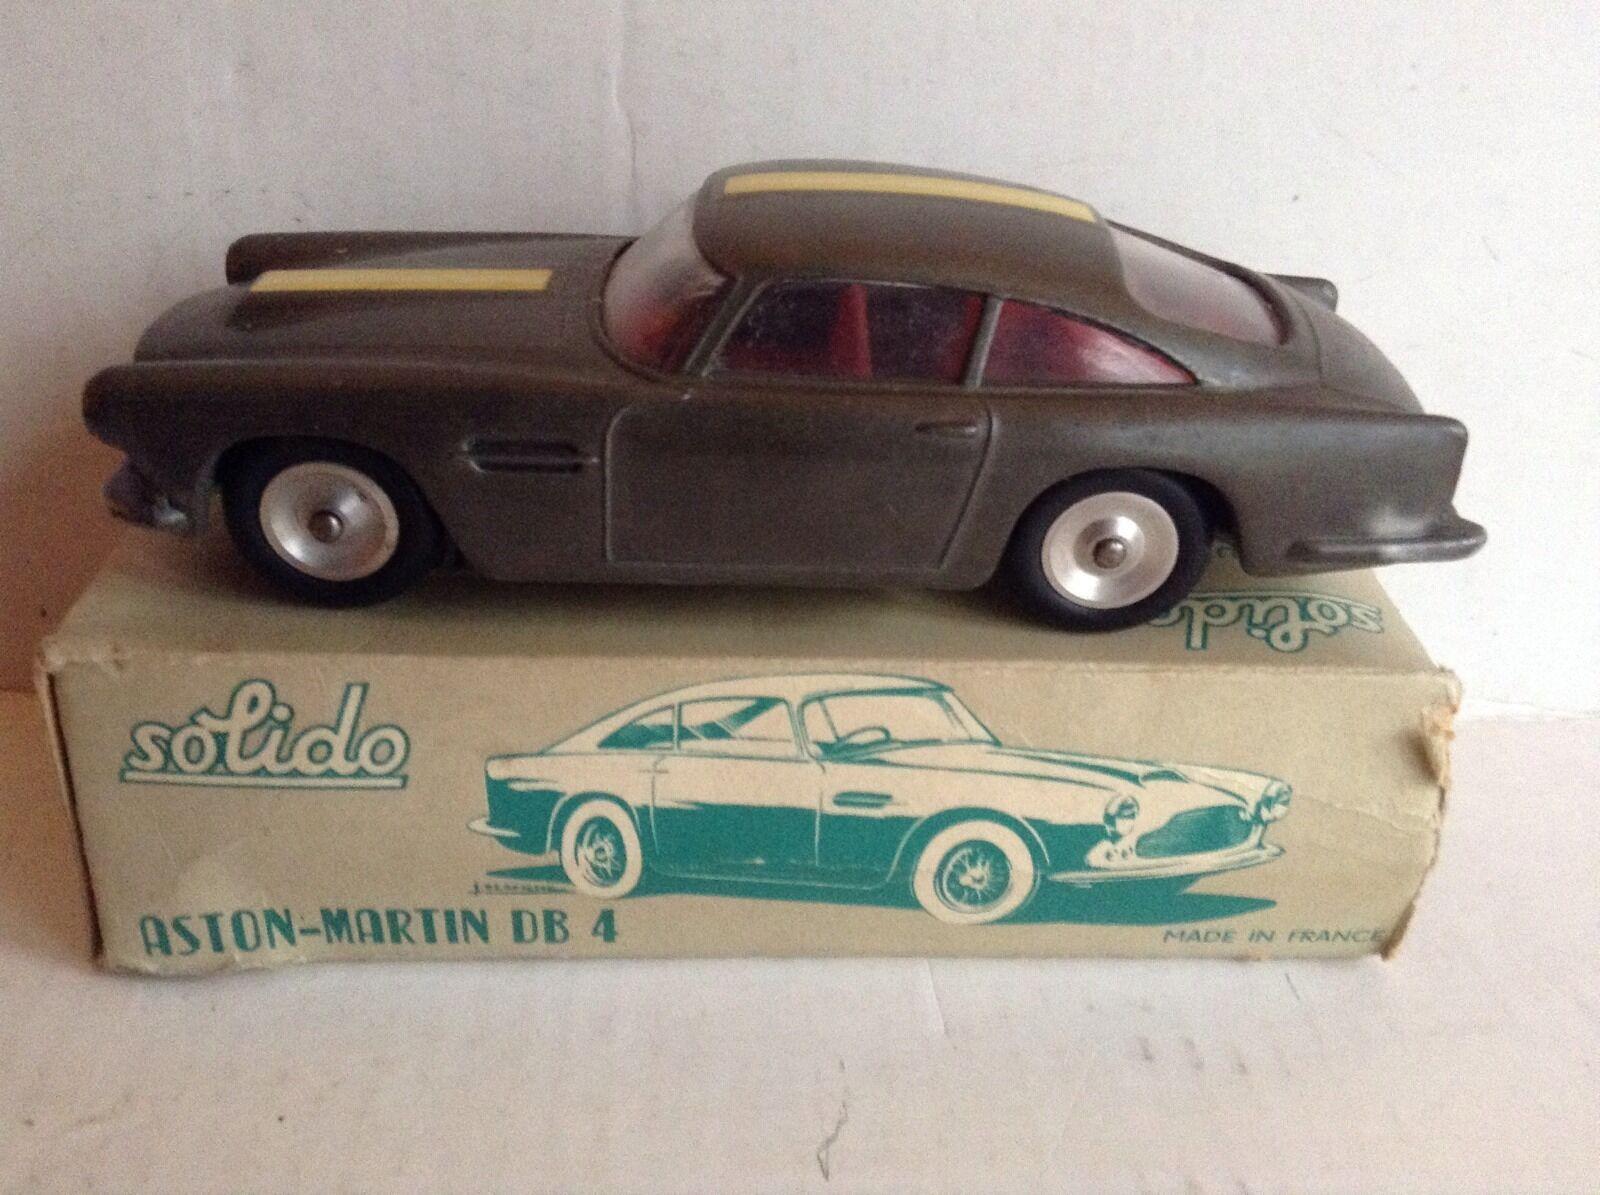 Solido Aston Martin DB4 nr menta in scatola 1960's